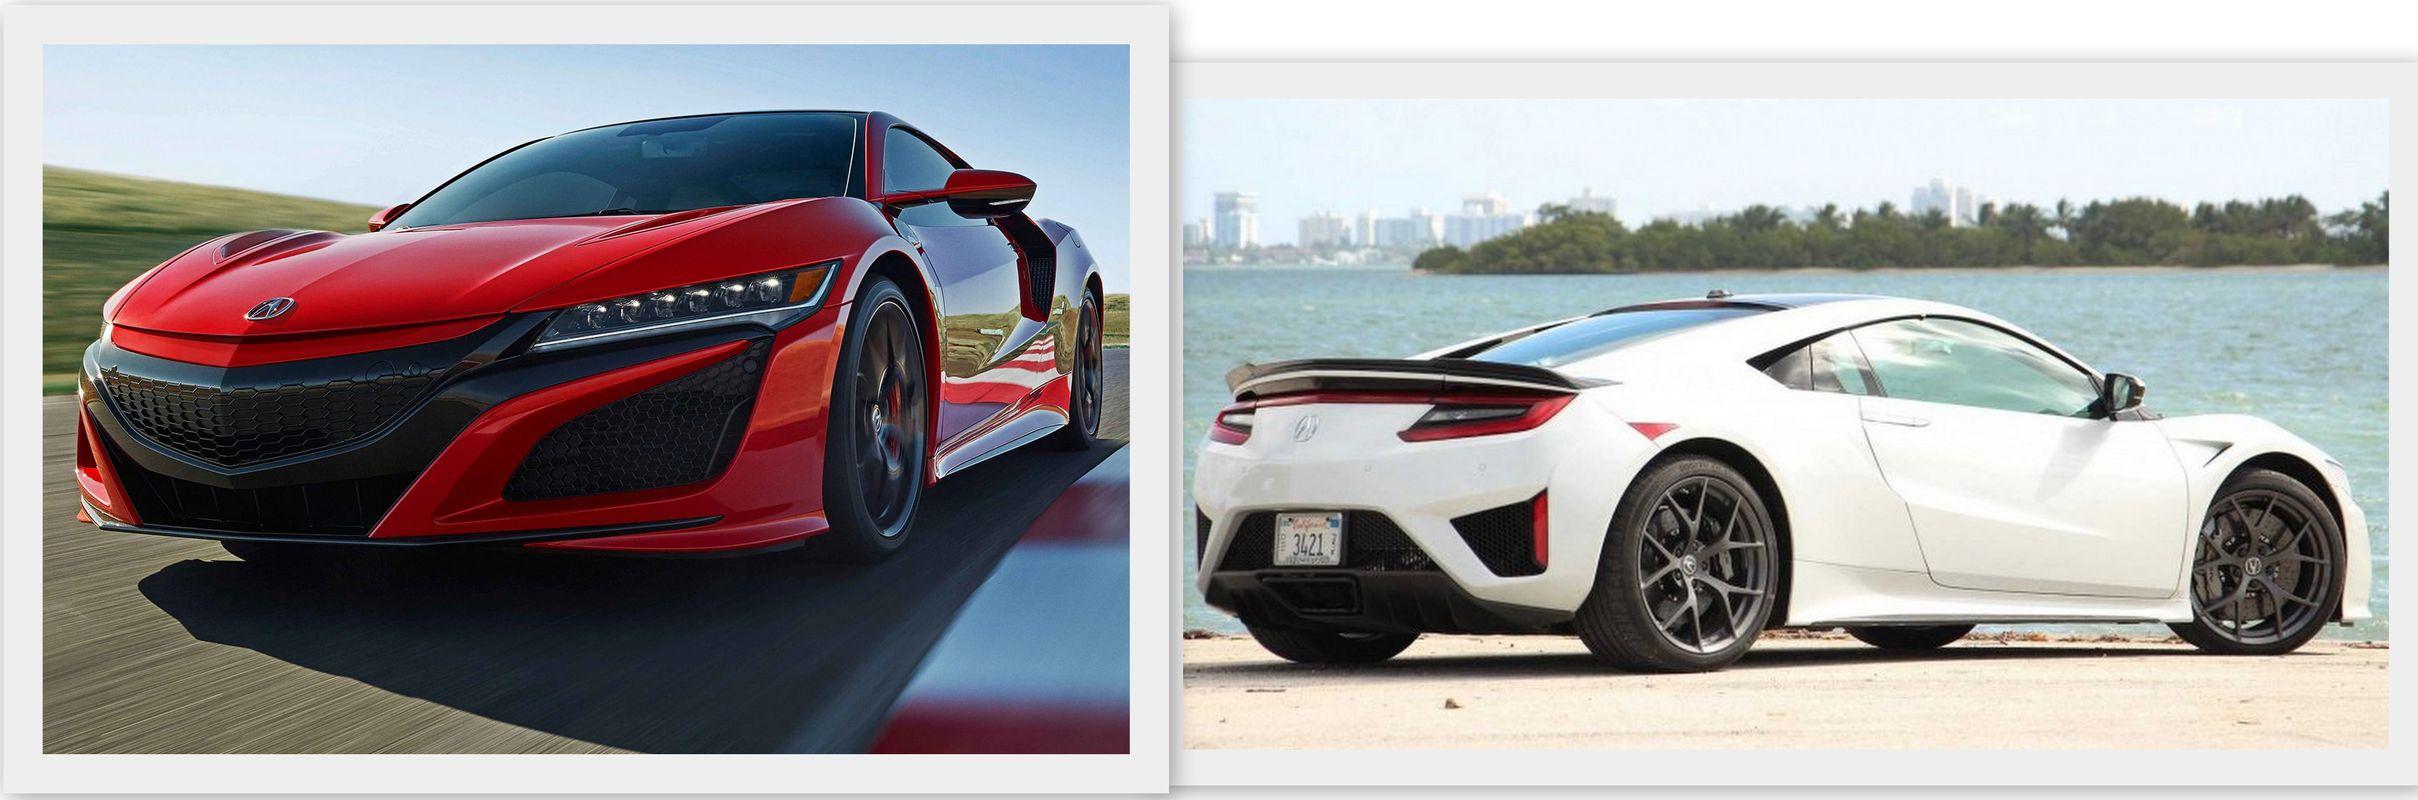 Машины 2021 - ТОП 30 новинок машин 2021 года